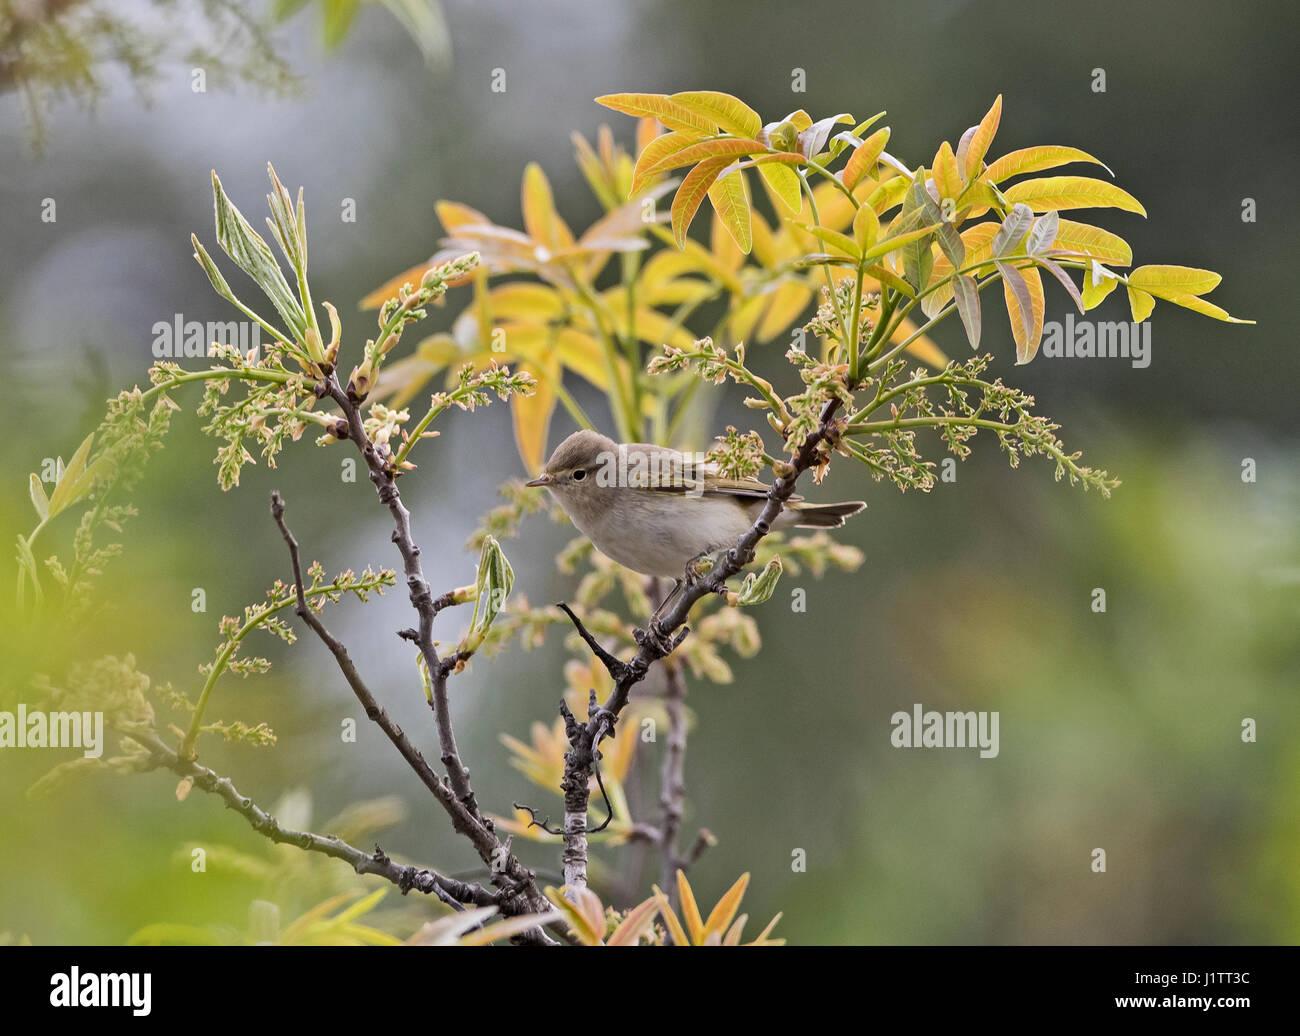 Eastern Bonellis Warbler Phylloscopus orientalis also callaedBalkan Warbler in Spring Cyprus Stock Photo